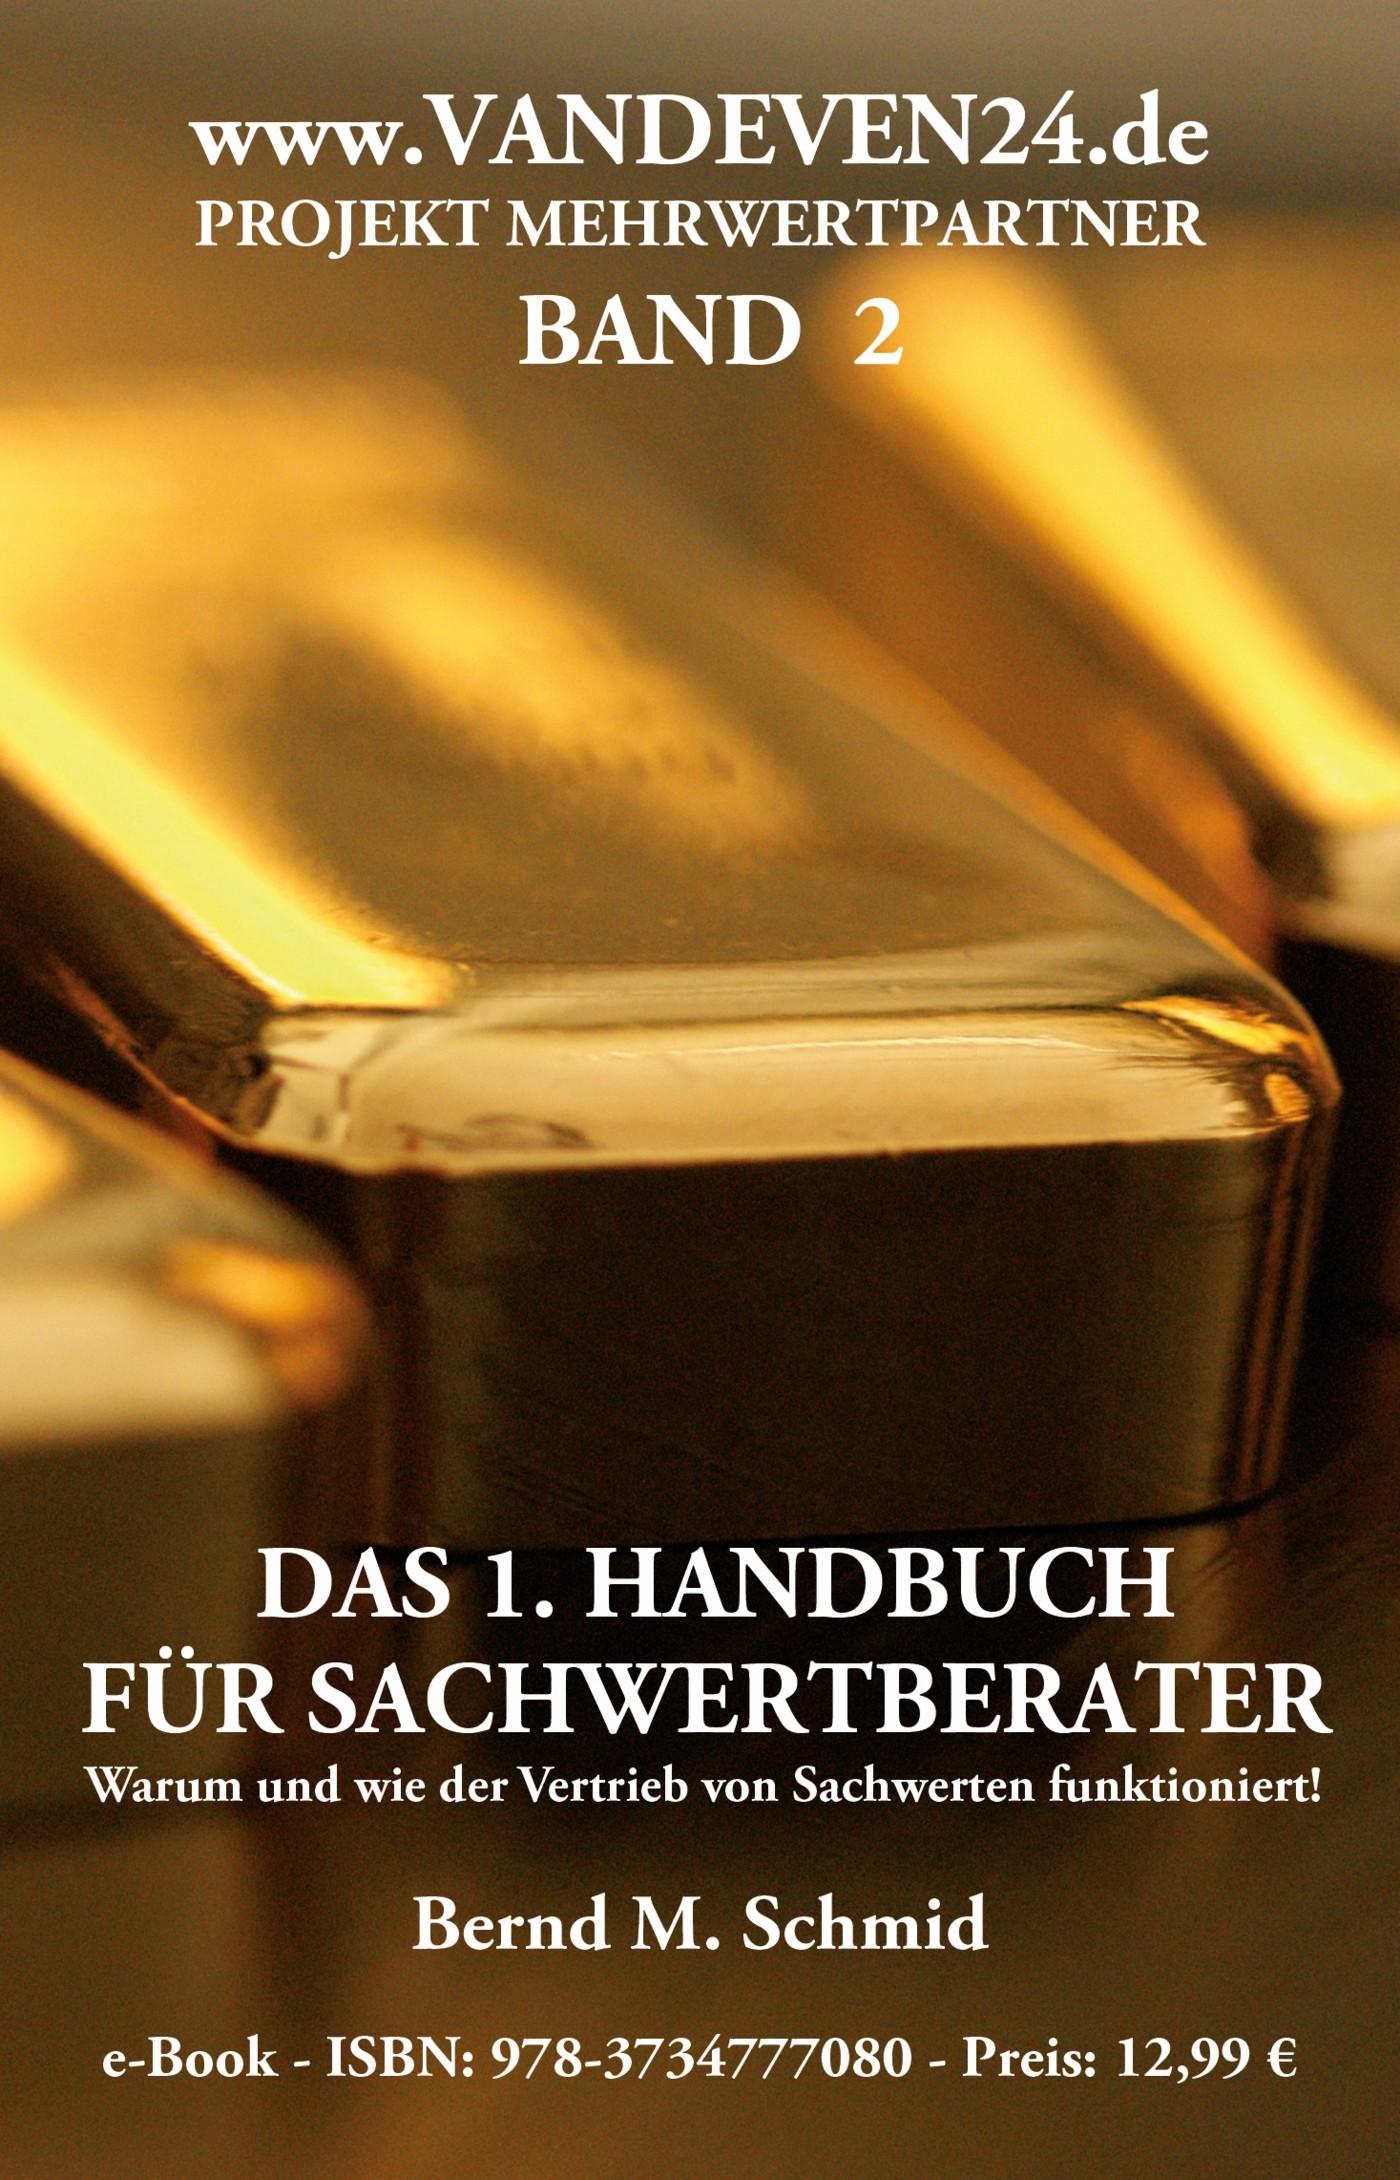 Handbuch-Cover-032015